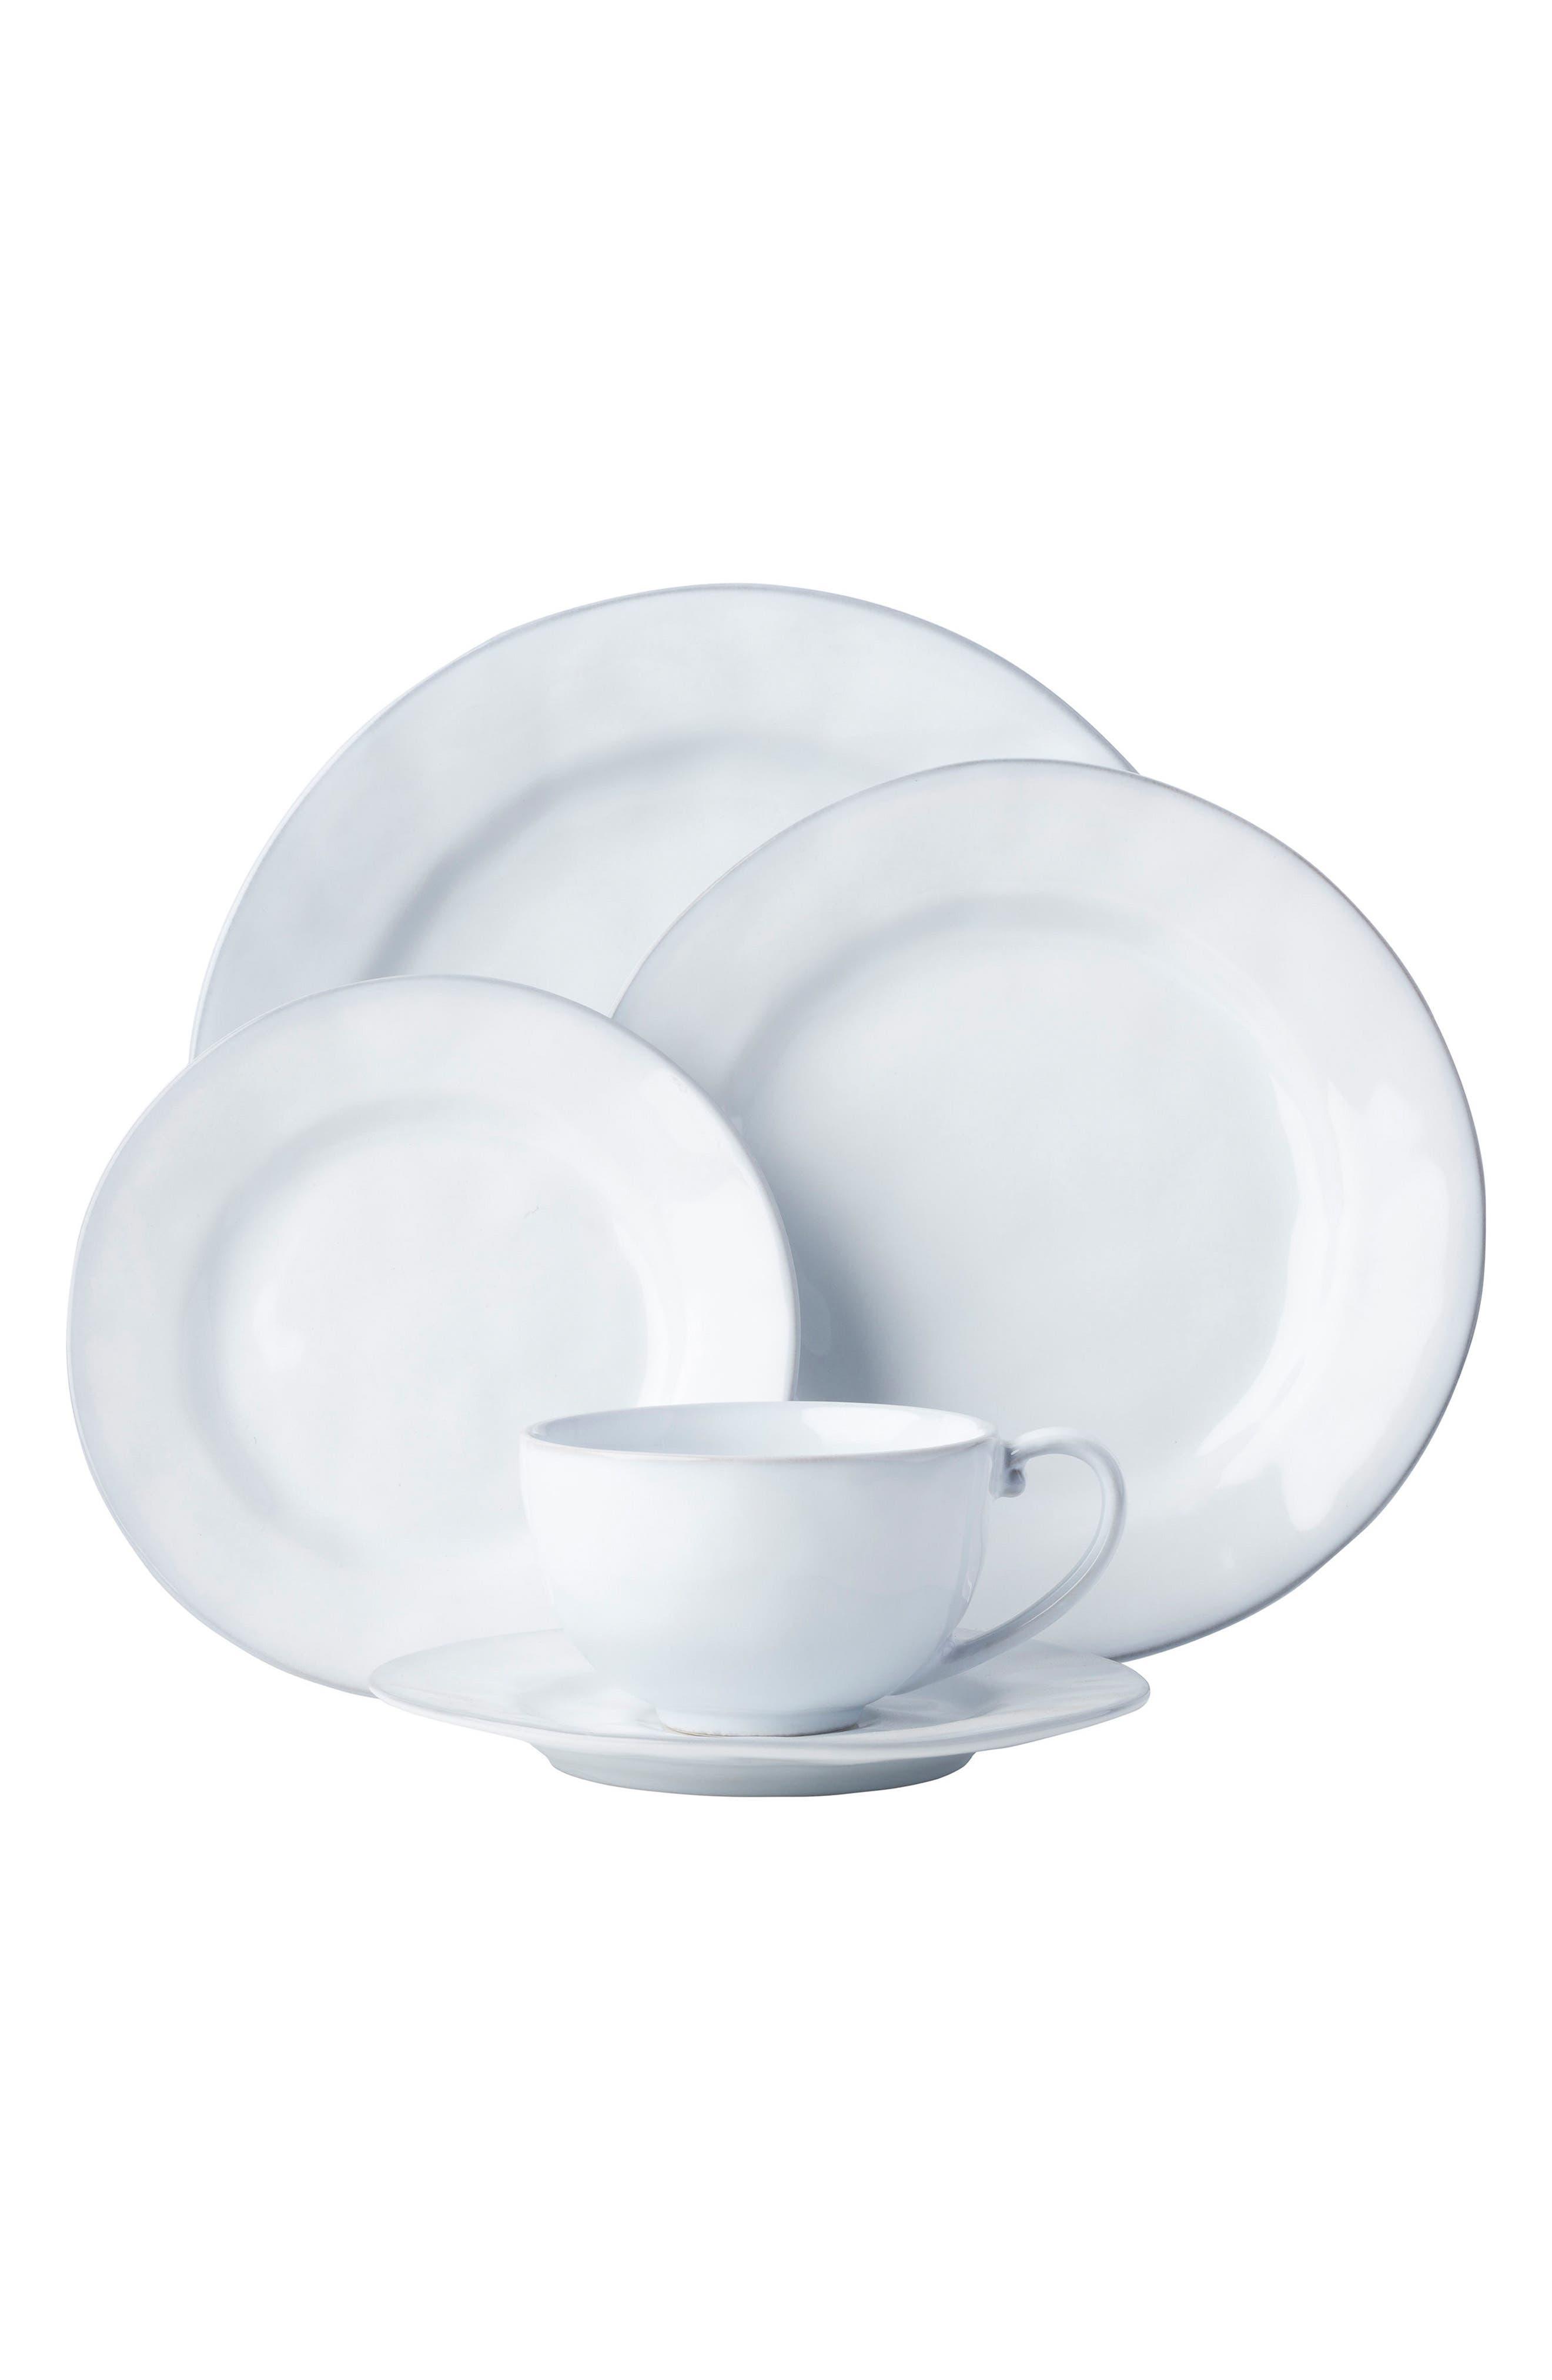 Quotidien 5-Piece Ceramic Place Setting,                         Main,                         color, White Truffle